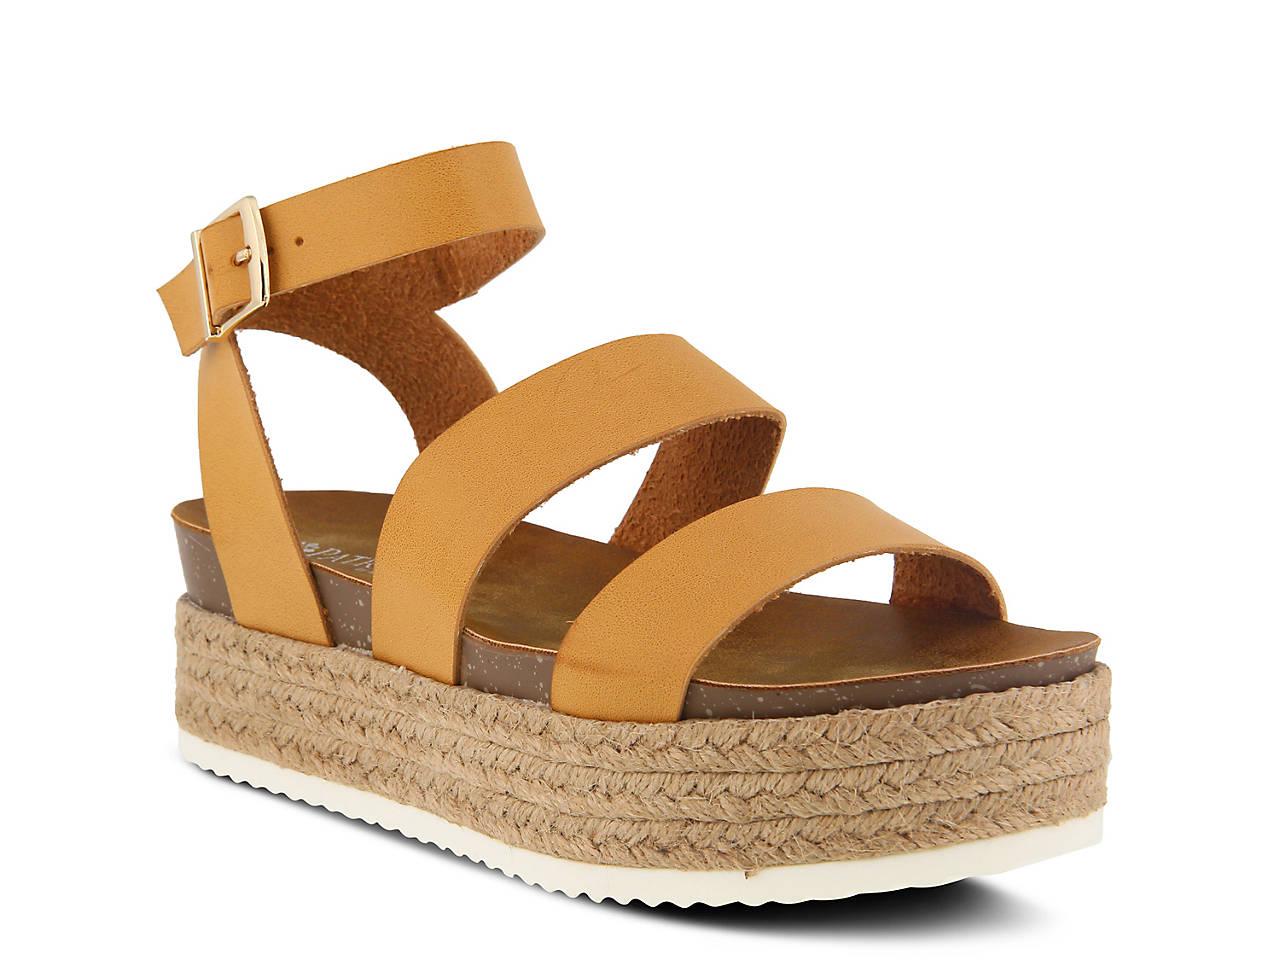 1fb830be1f Patrizia by Spring Step Larissa Espadrille Platform Sandal Women's ...